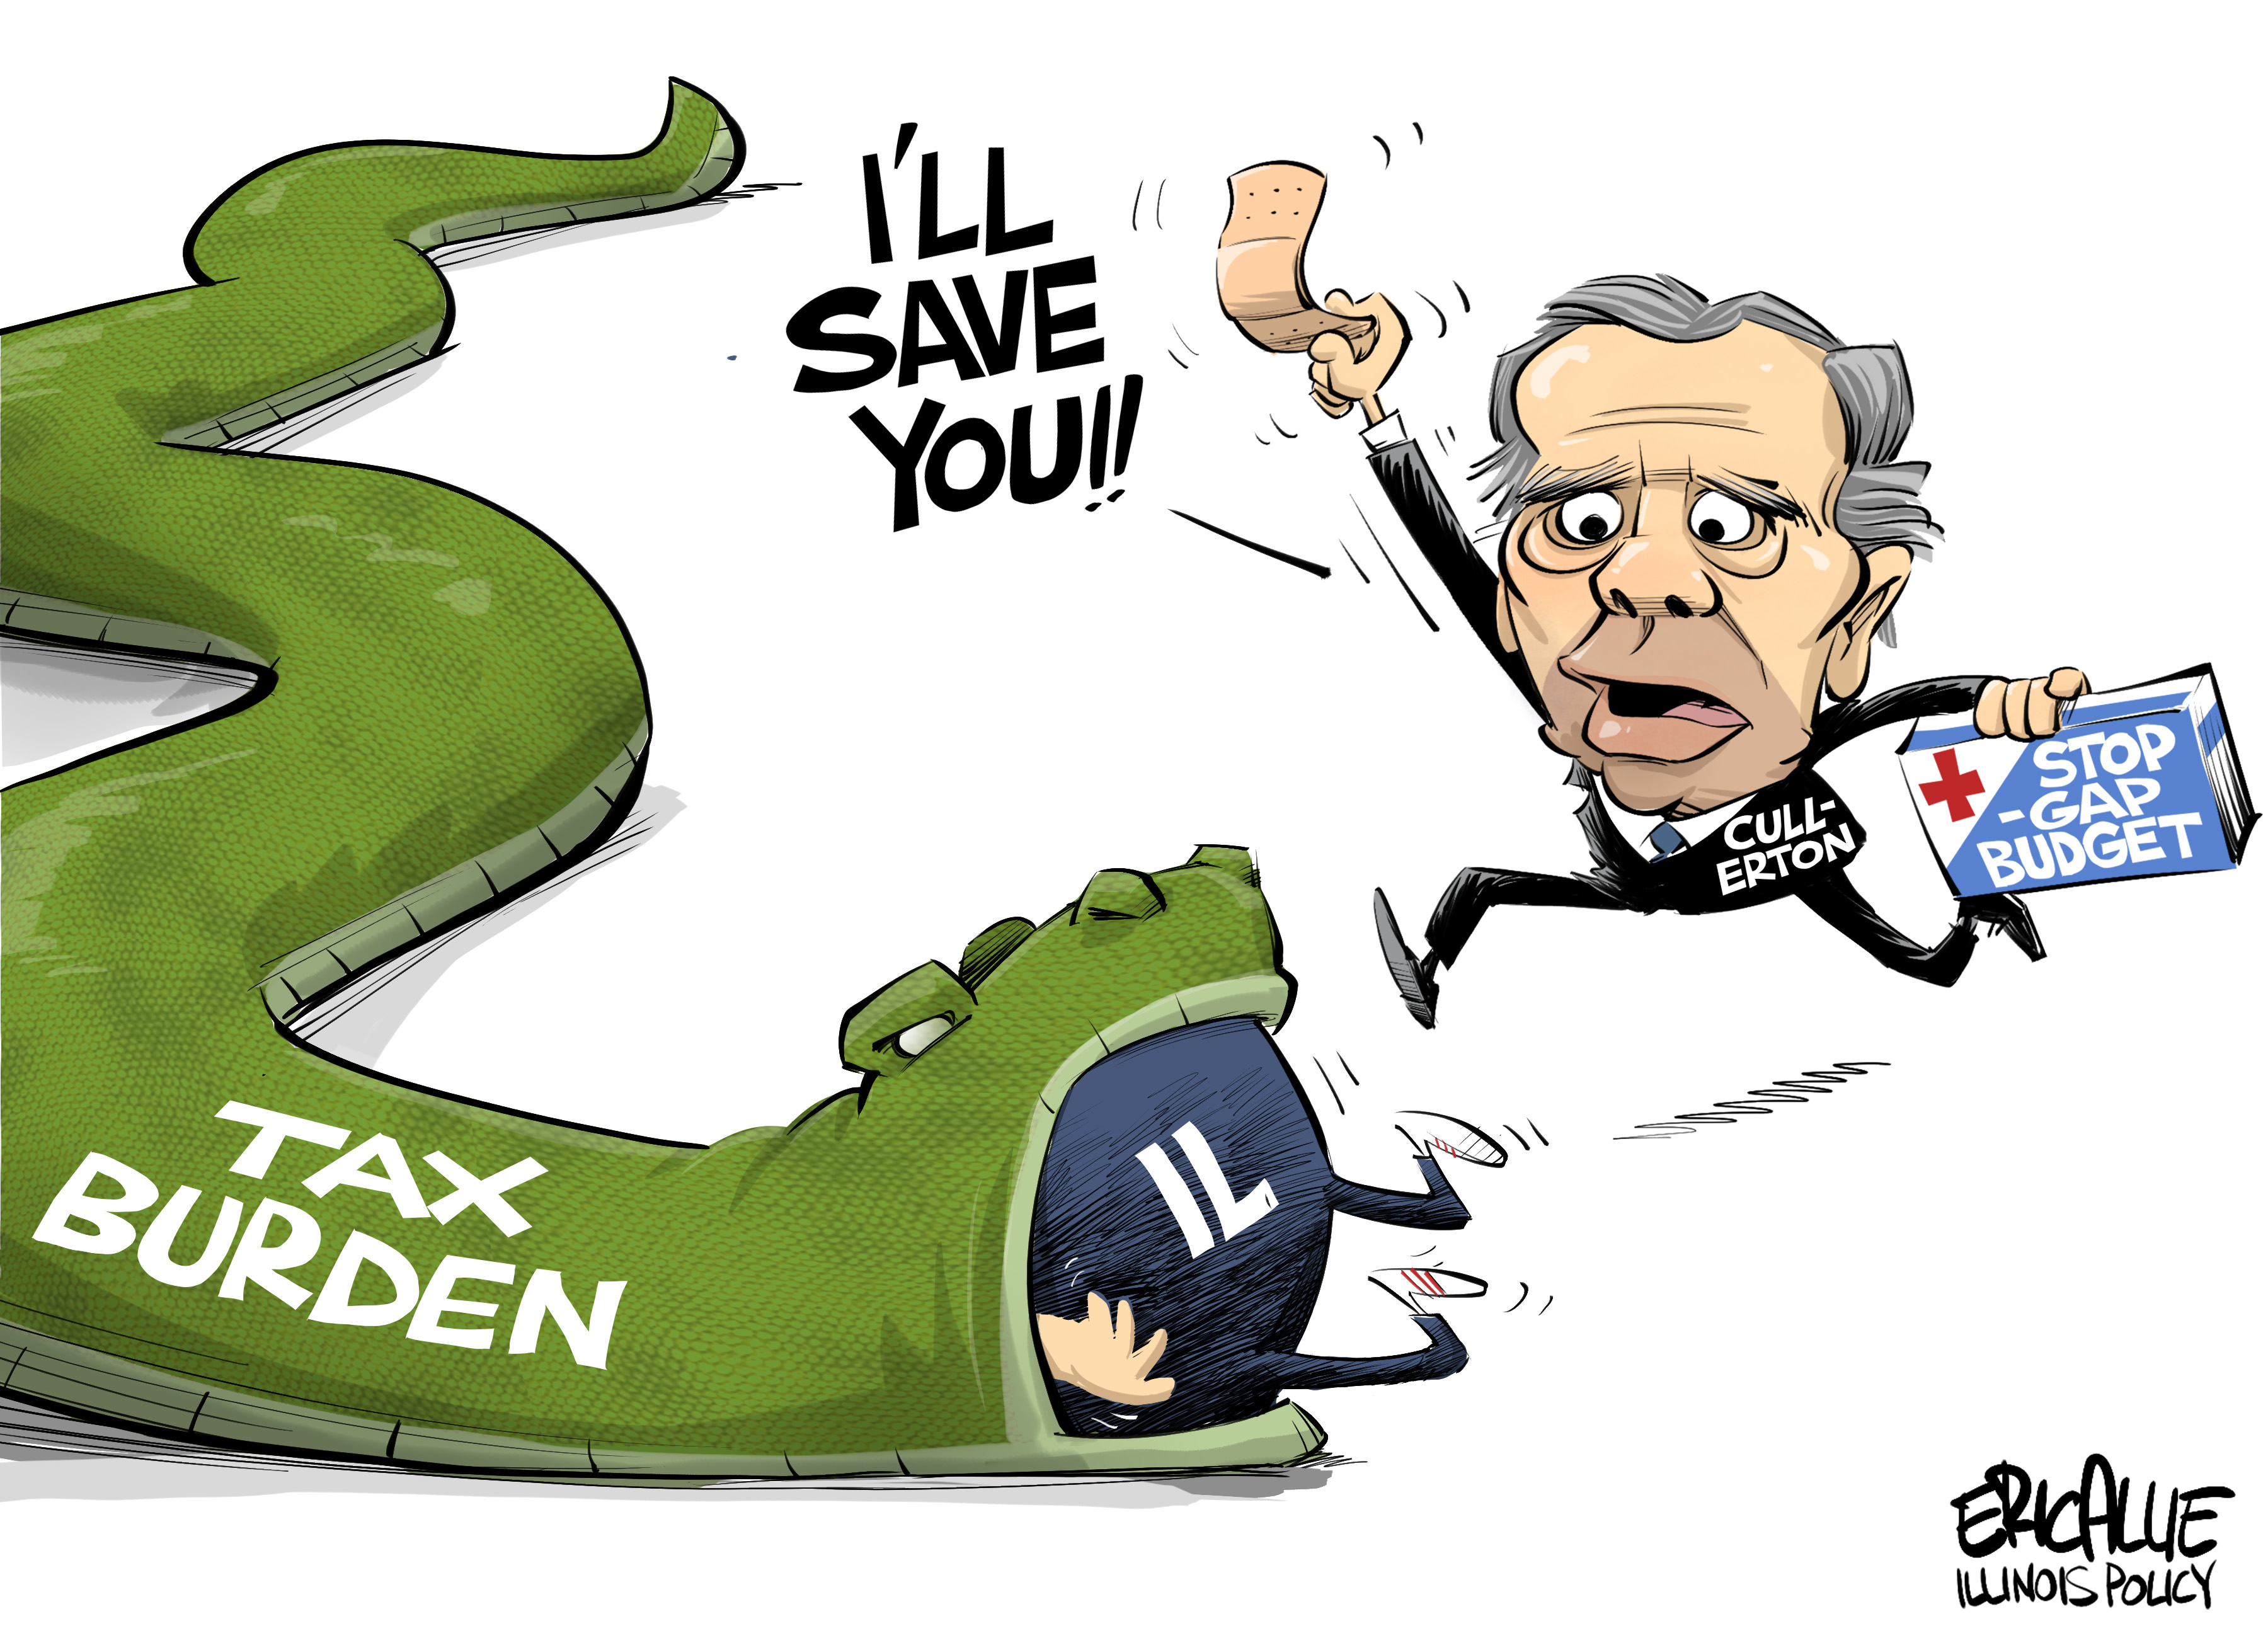 Illinois stopgap budget – Eric Allie Cartoon